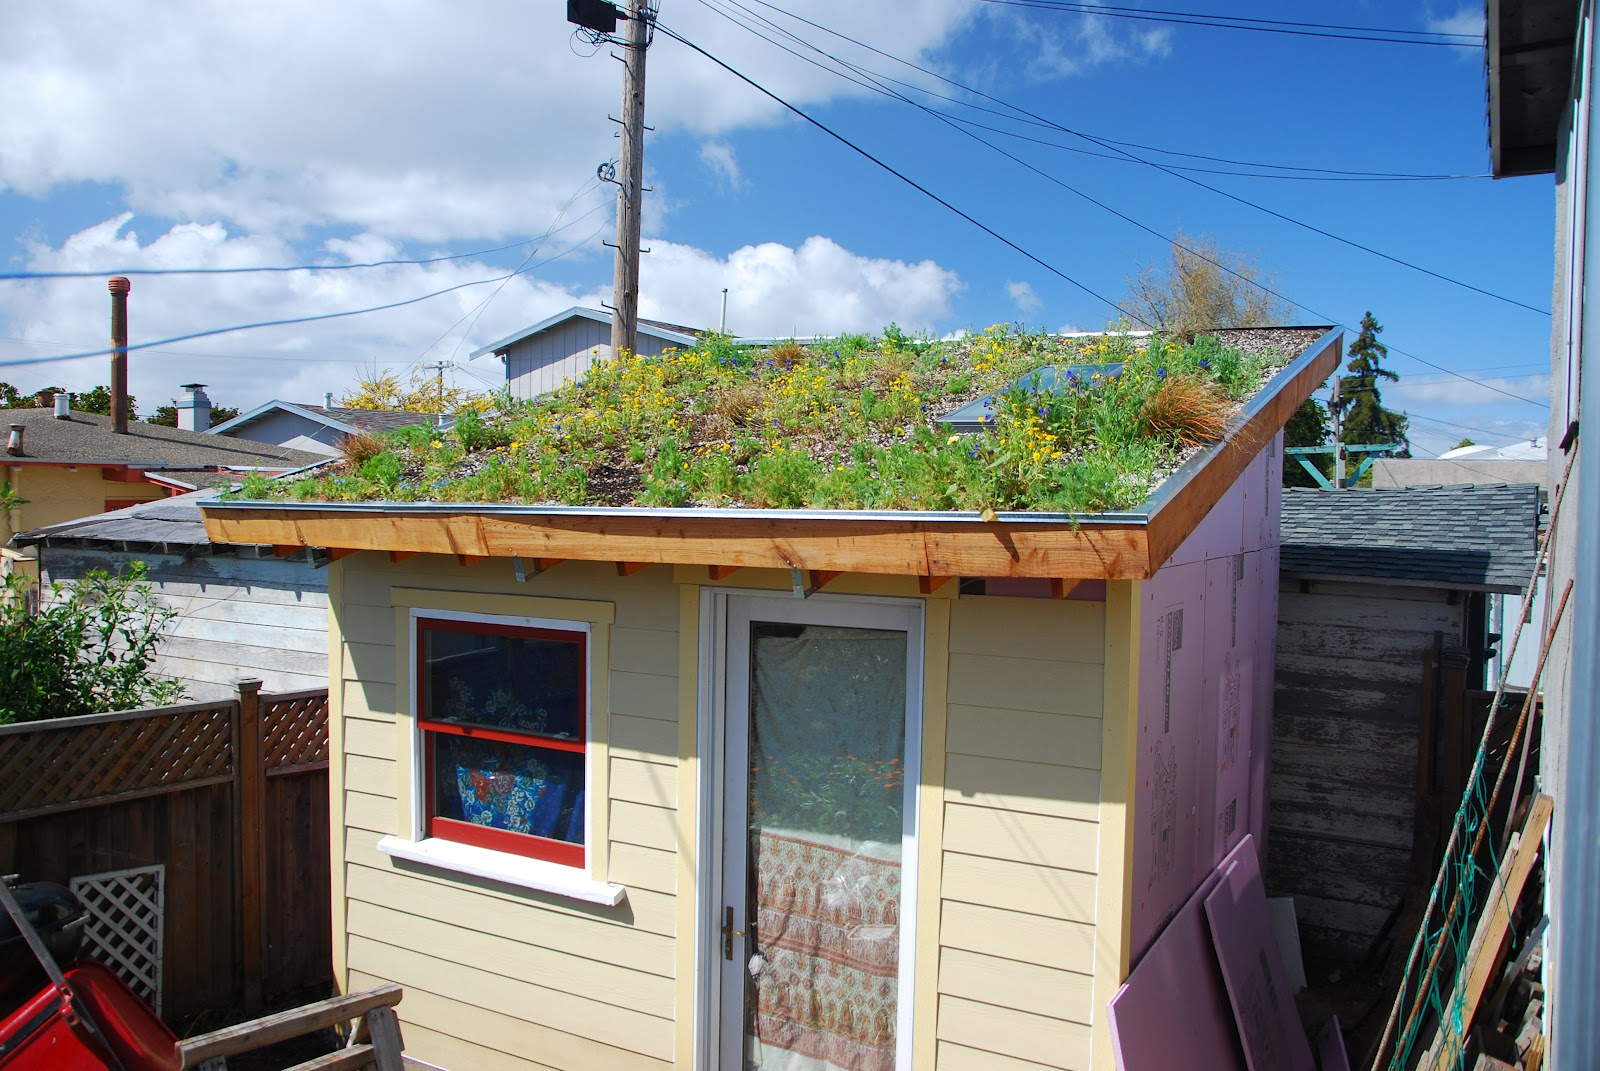 Tiny backyard house green roof in bloom loft built for Tiny backyard houses